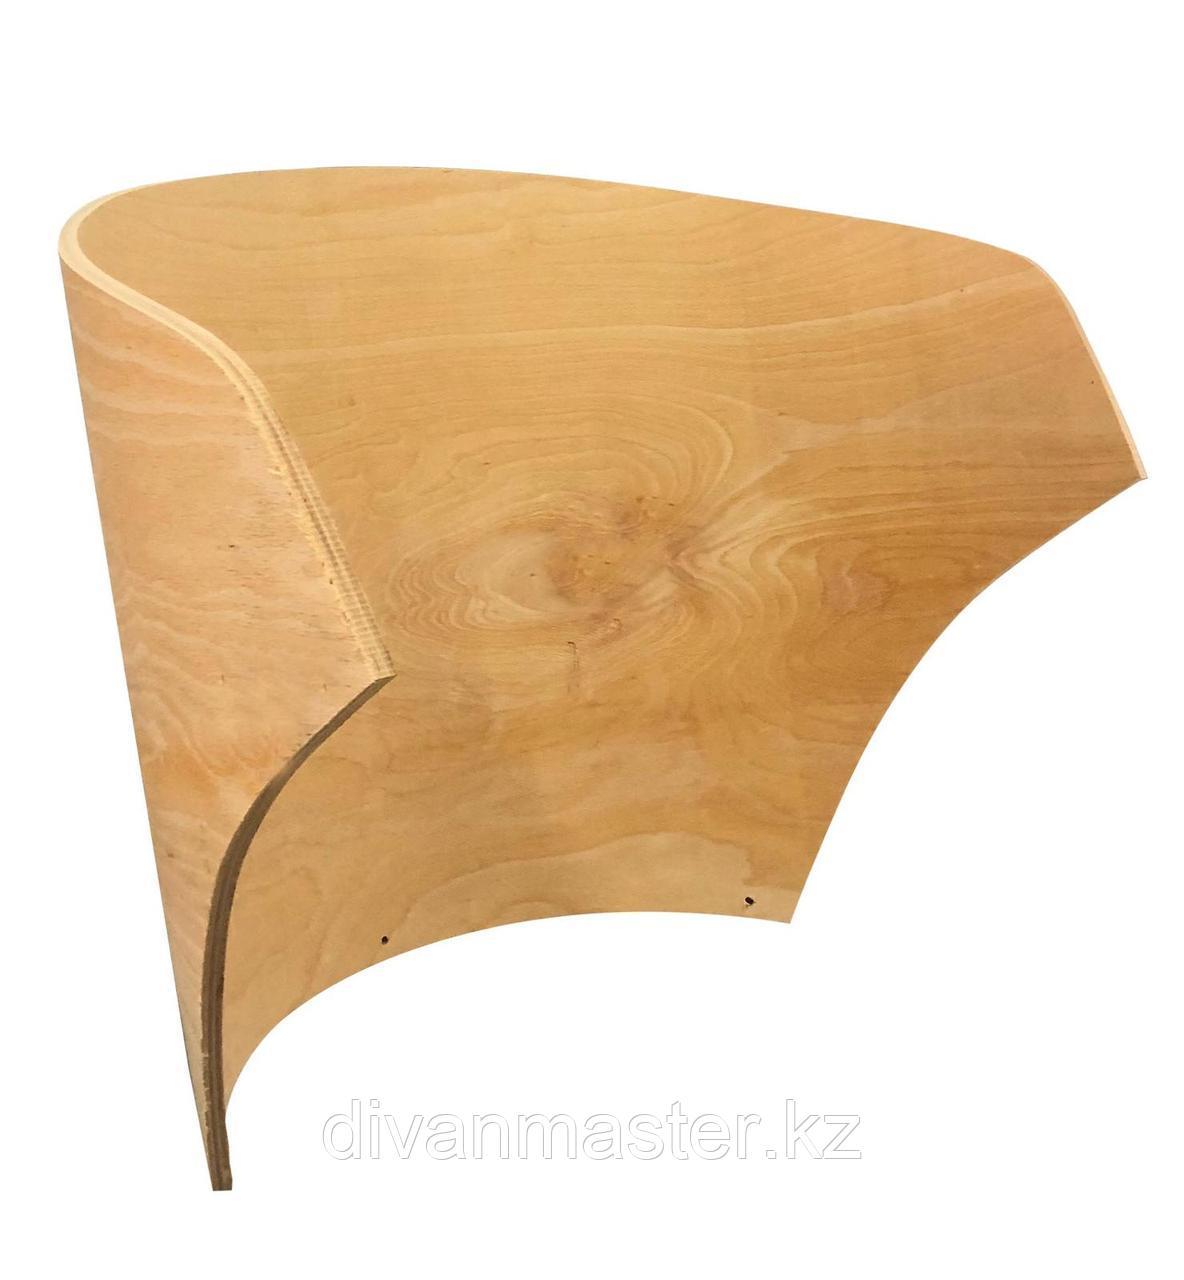 Гнутая спинка для каркаса стула - VERA